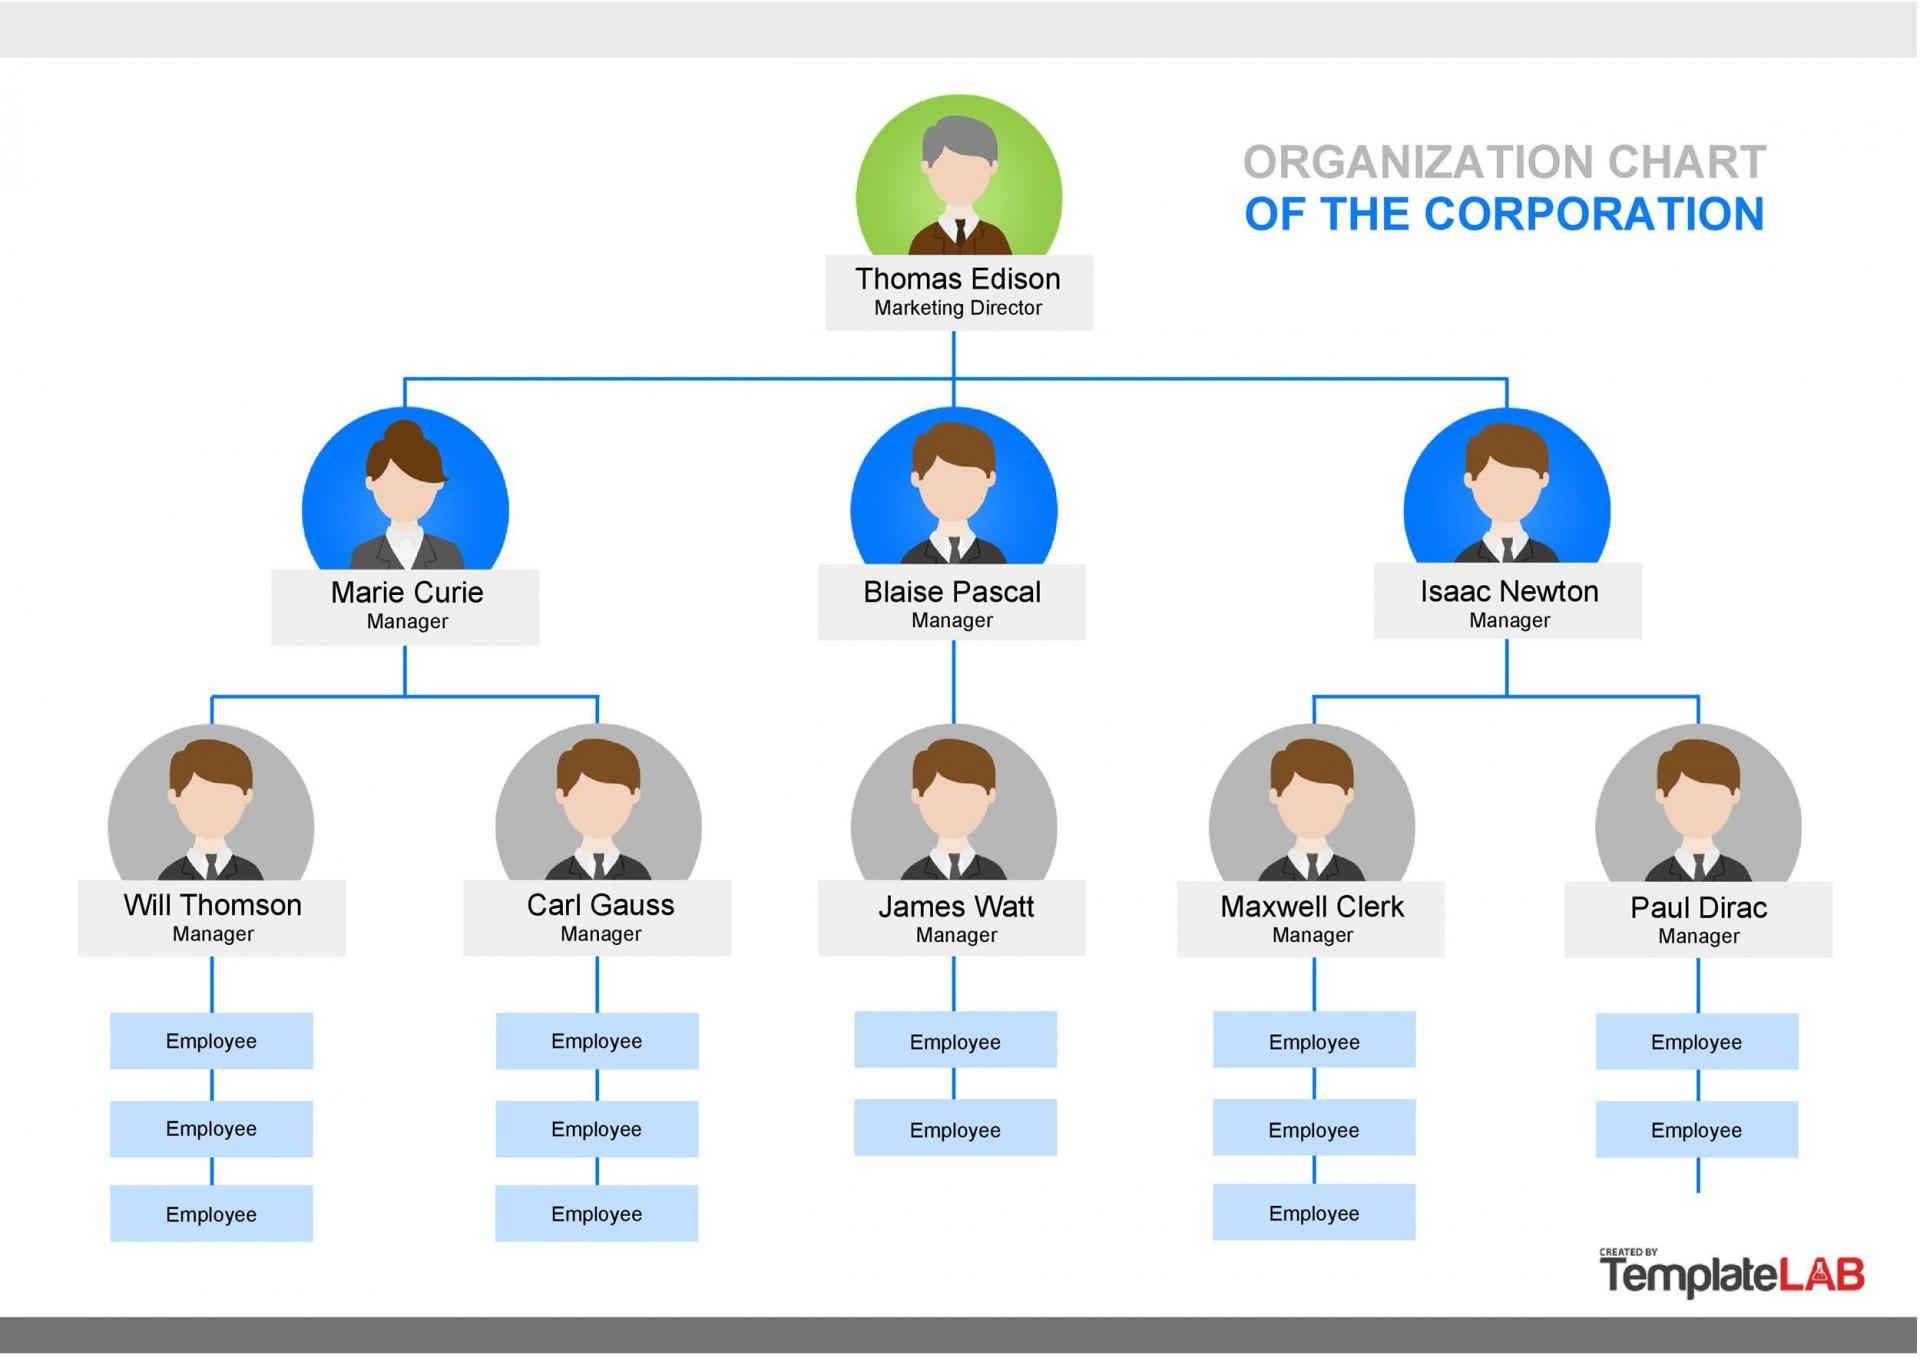 004 Surprising Microsoft Organisation Chart Template Sample  Visio Organization Excel Office1920